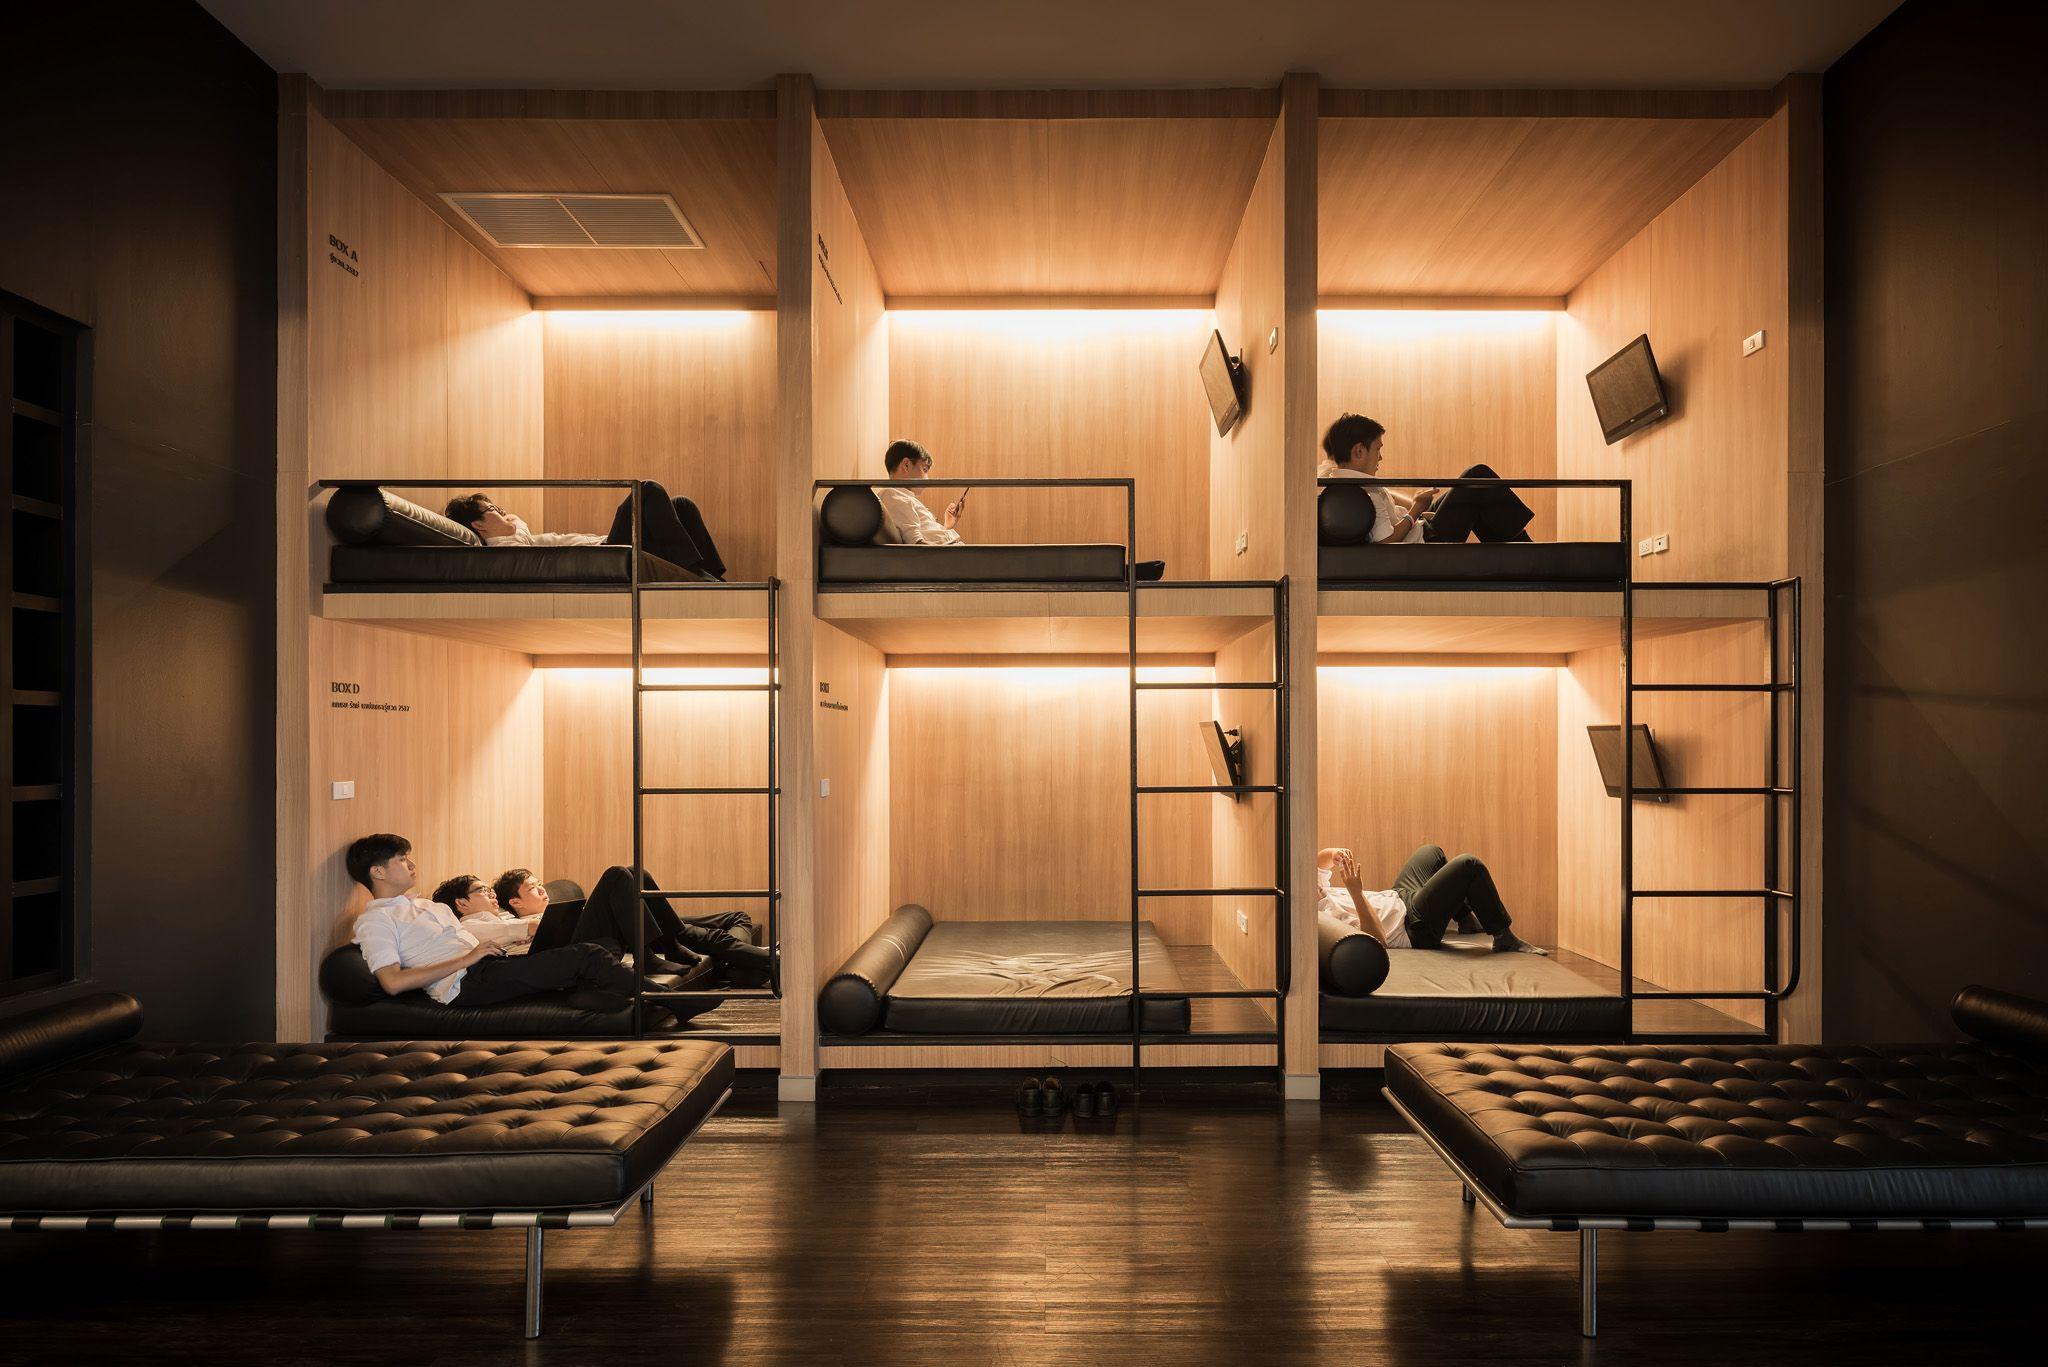 Interior Joosung Woo - 2019 2